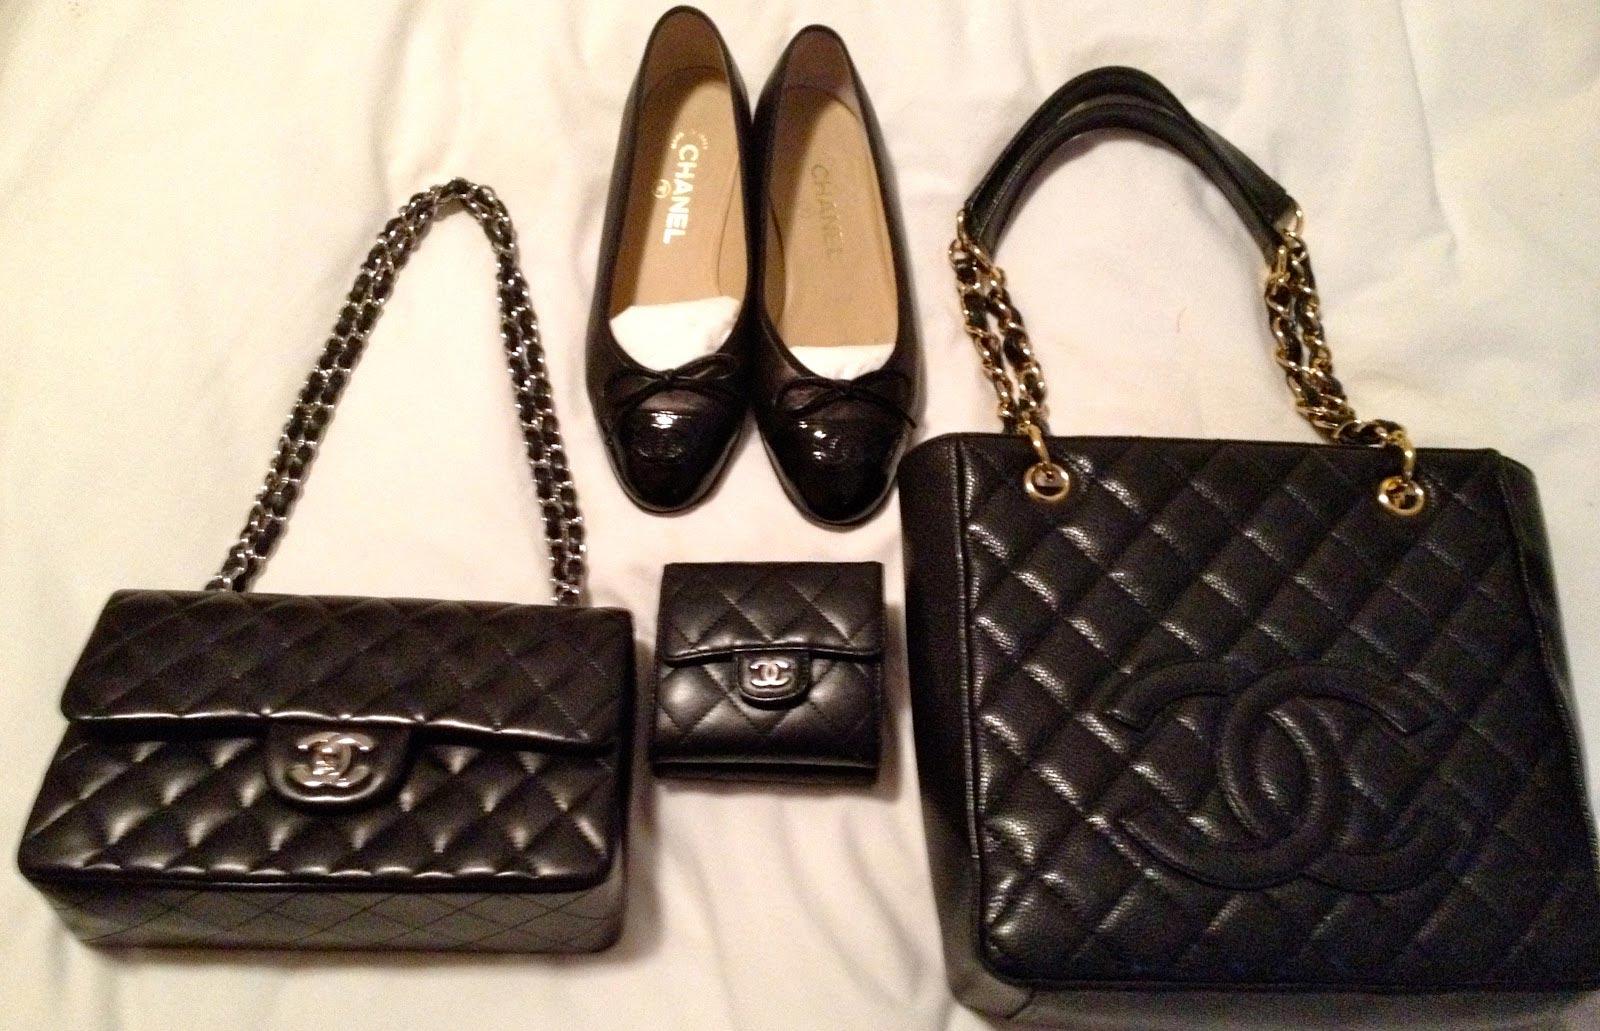 Uk Duty Free Chanel Handbags Ultimate Lifestylist